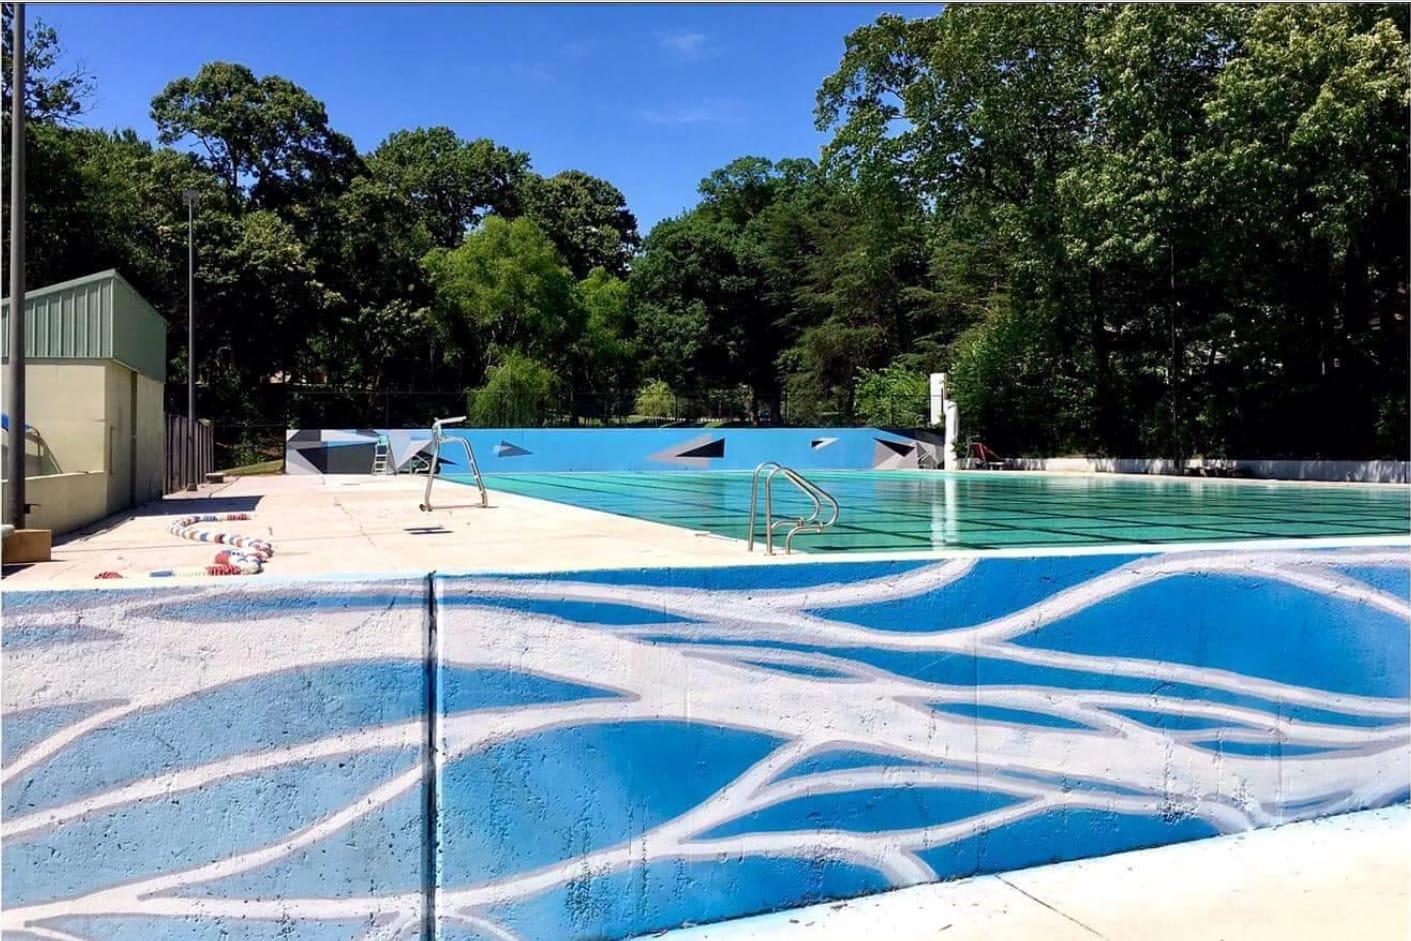 Public Art At Grant Park Pool Gets A Refresh The Porch Press